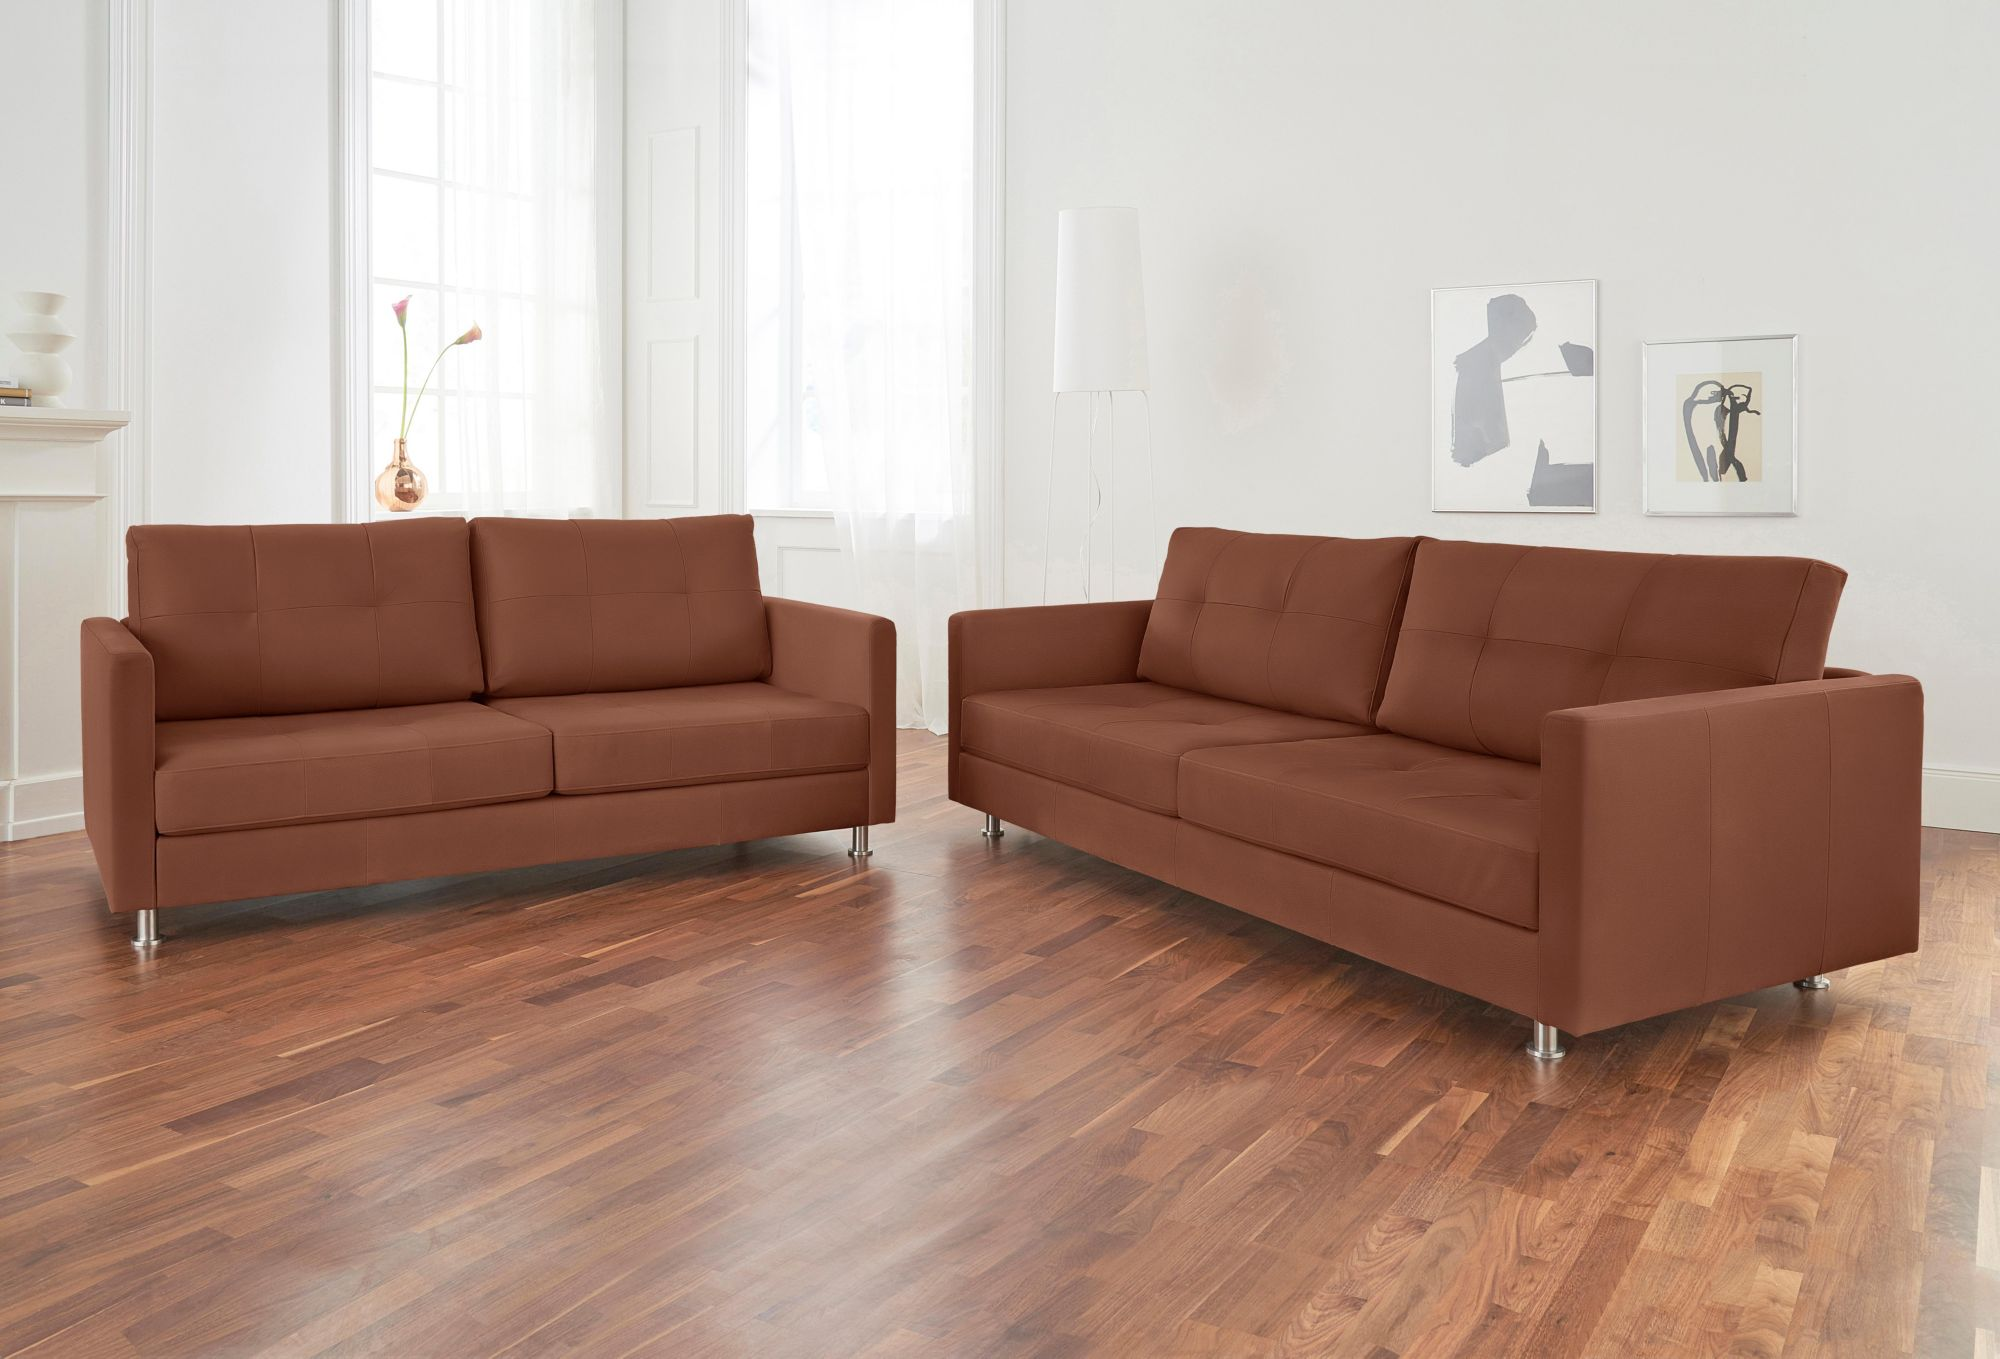 ALTE GERBEREI Alte Gerberei 2-Sitzer Sofa »Vincent« mit Steppung, inklusive Rückenkissen